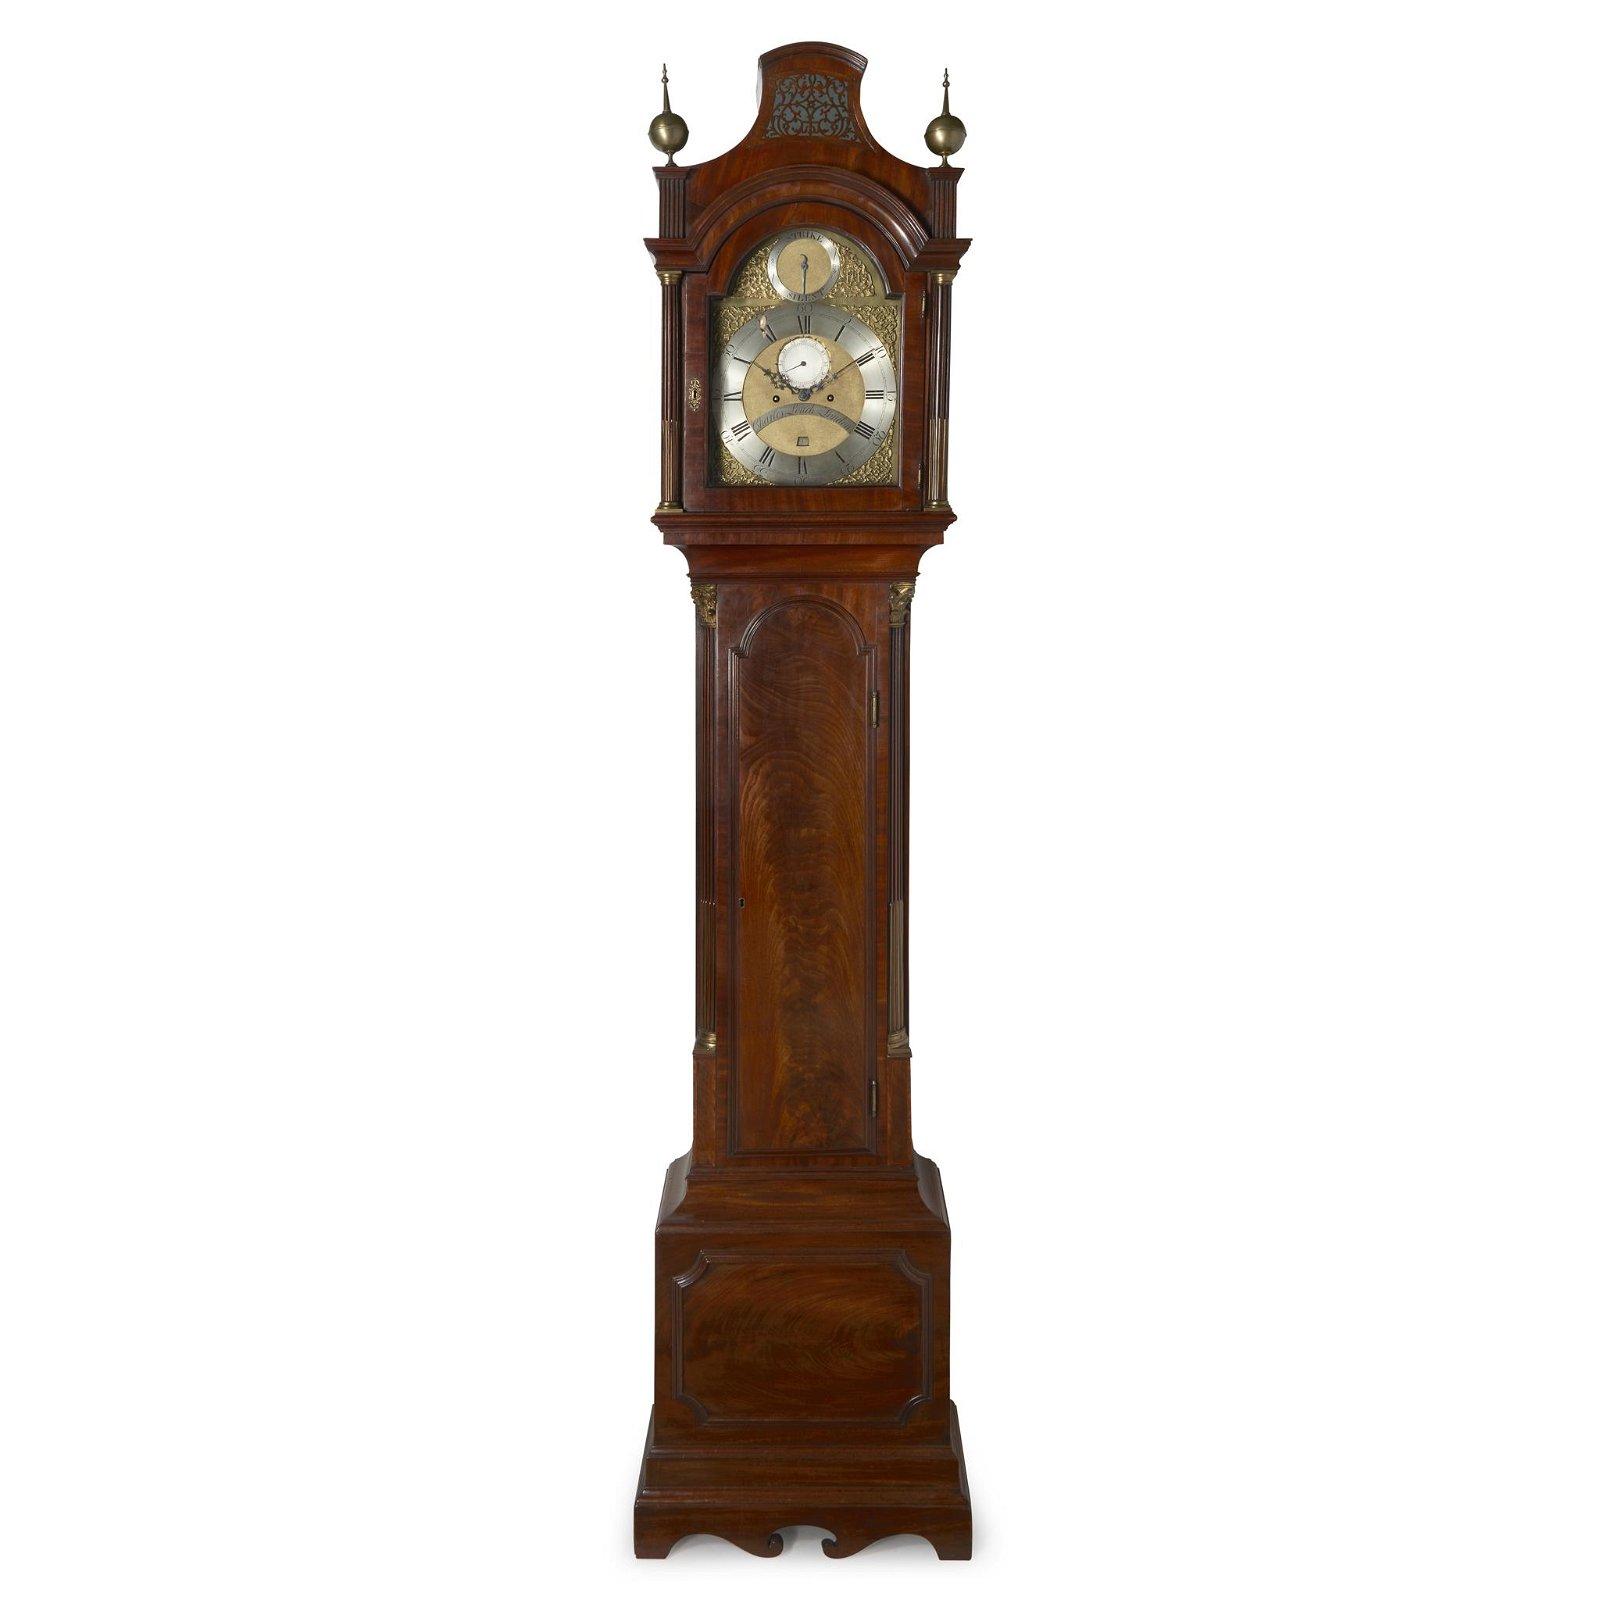 A George III brass-mounted mahogany tall case clock,